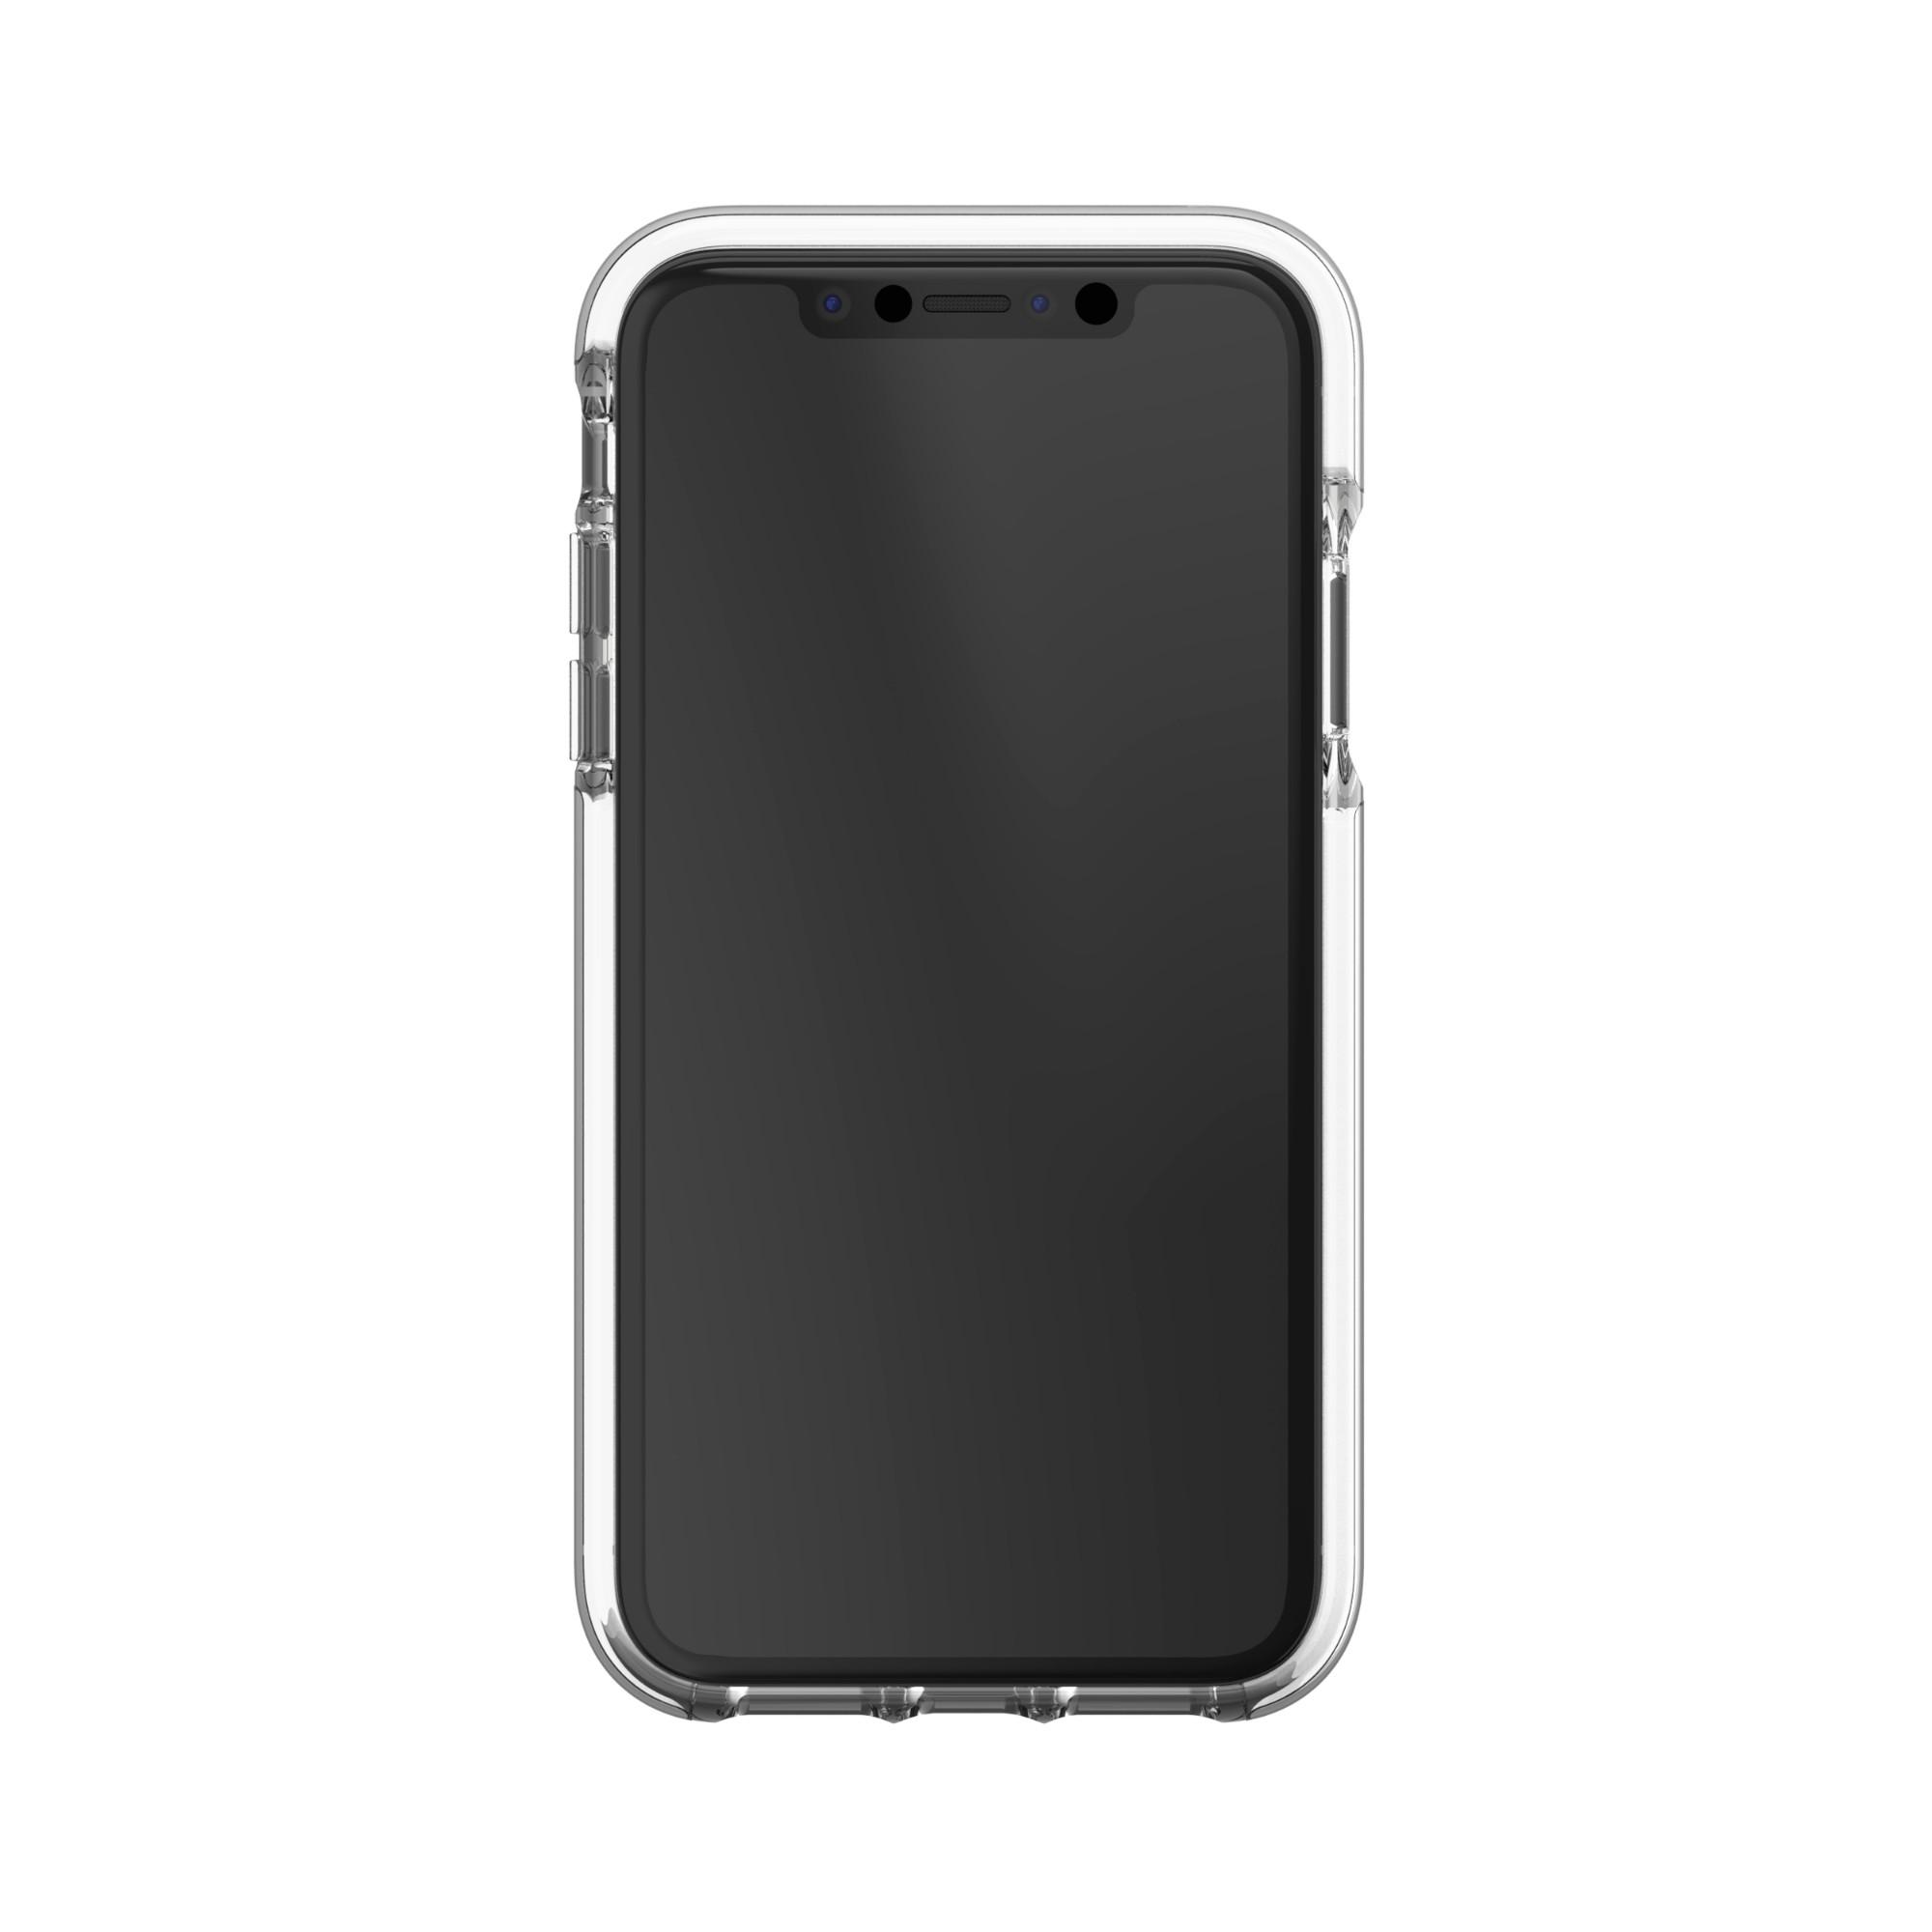 "GEAR4 Piccadilly funda para teléfono móvil 15,5 cm (6.1"") Blanco"